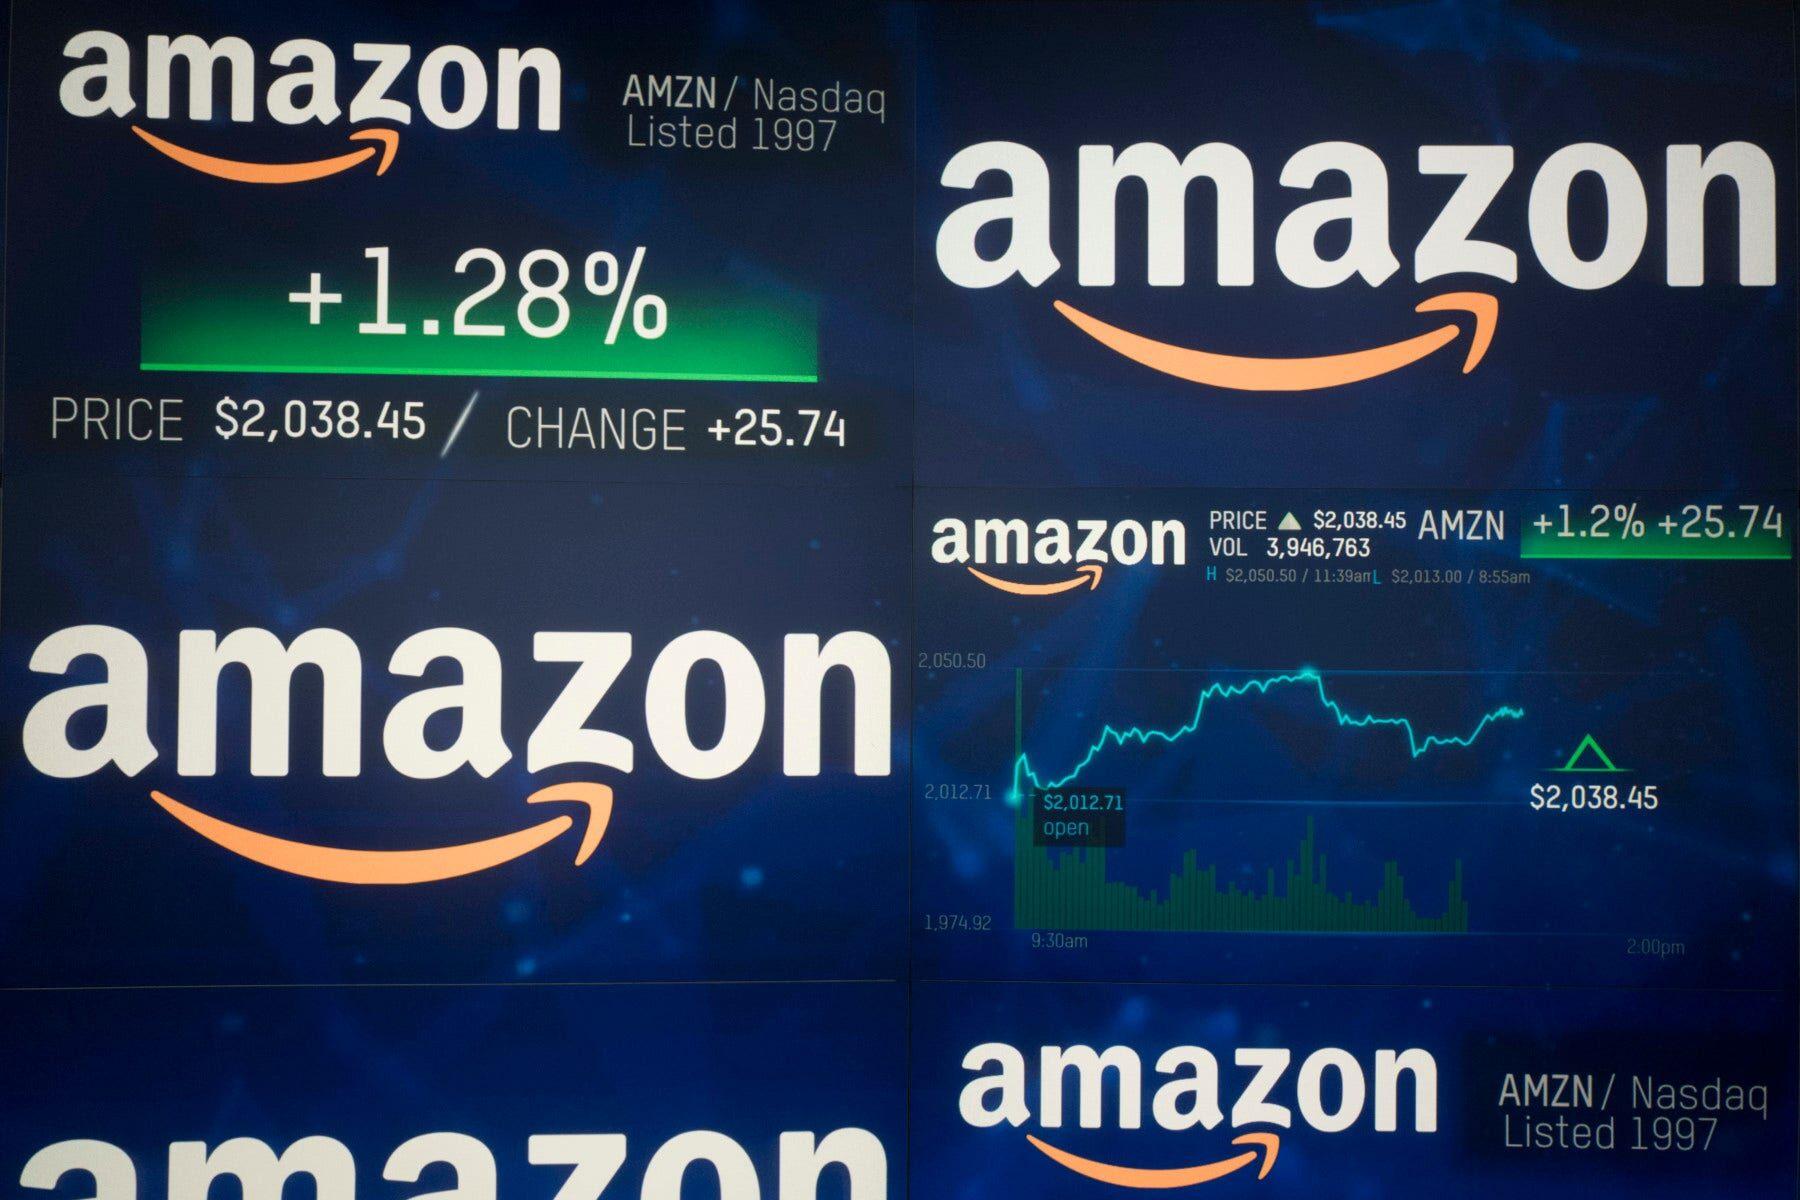 Amazon Hits 1 Trillion In Market Value News